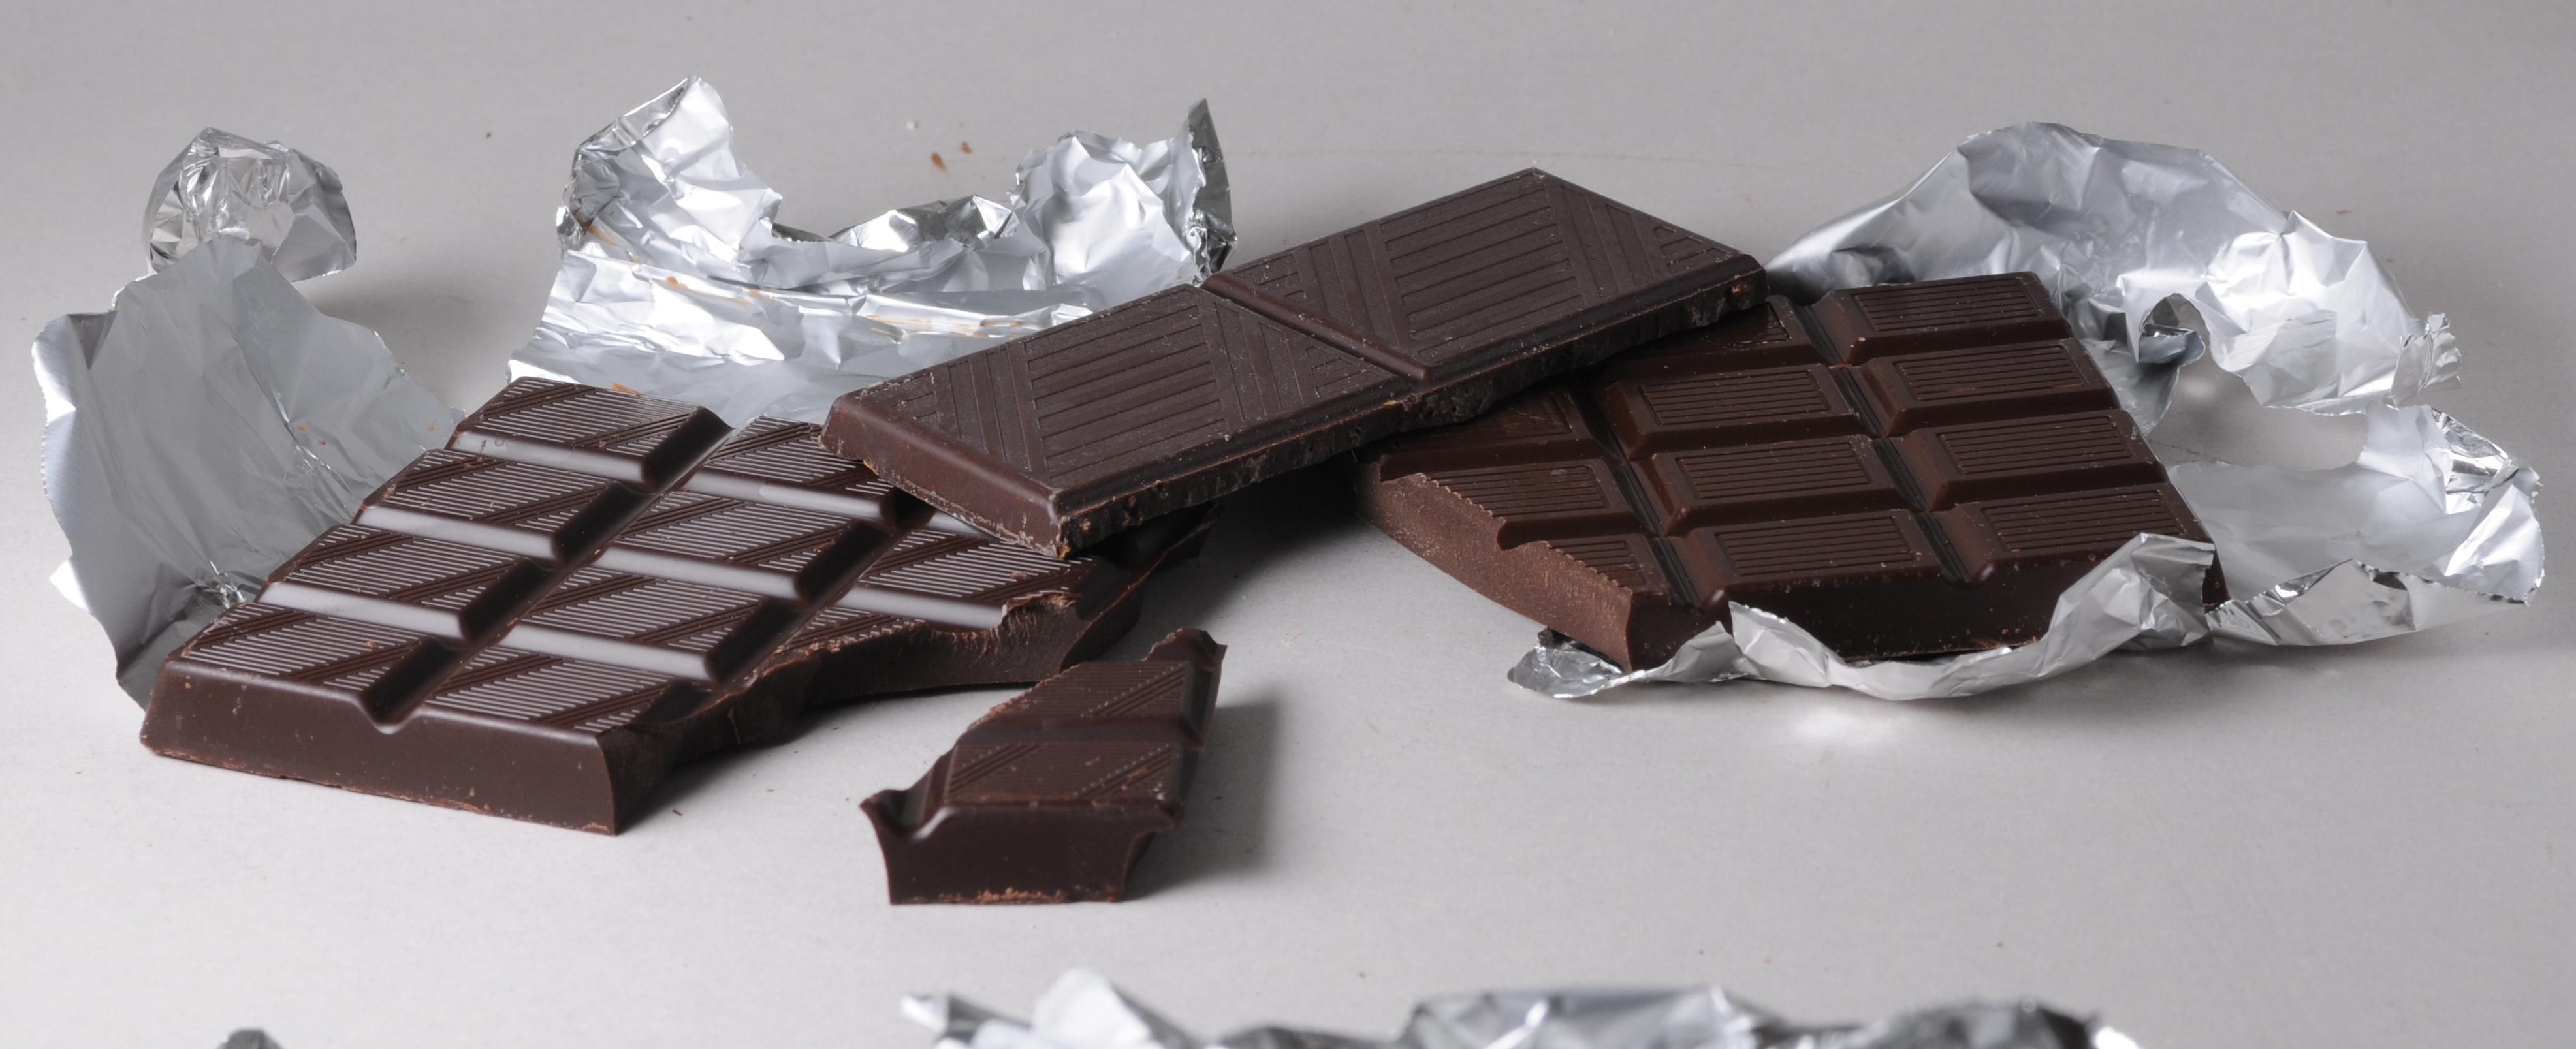 Epicatechin – The Dark Force Behind Dark Chocolate